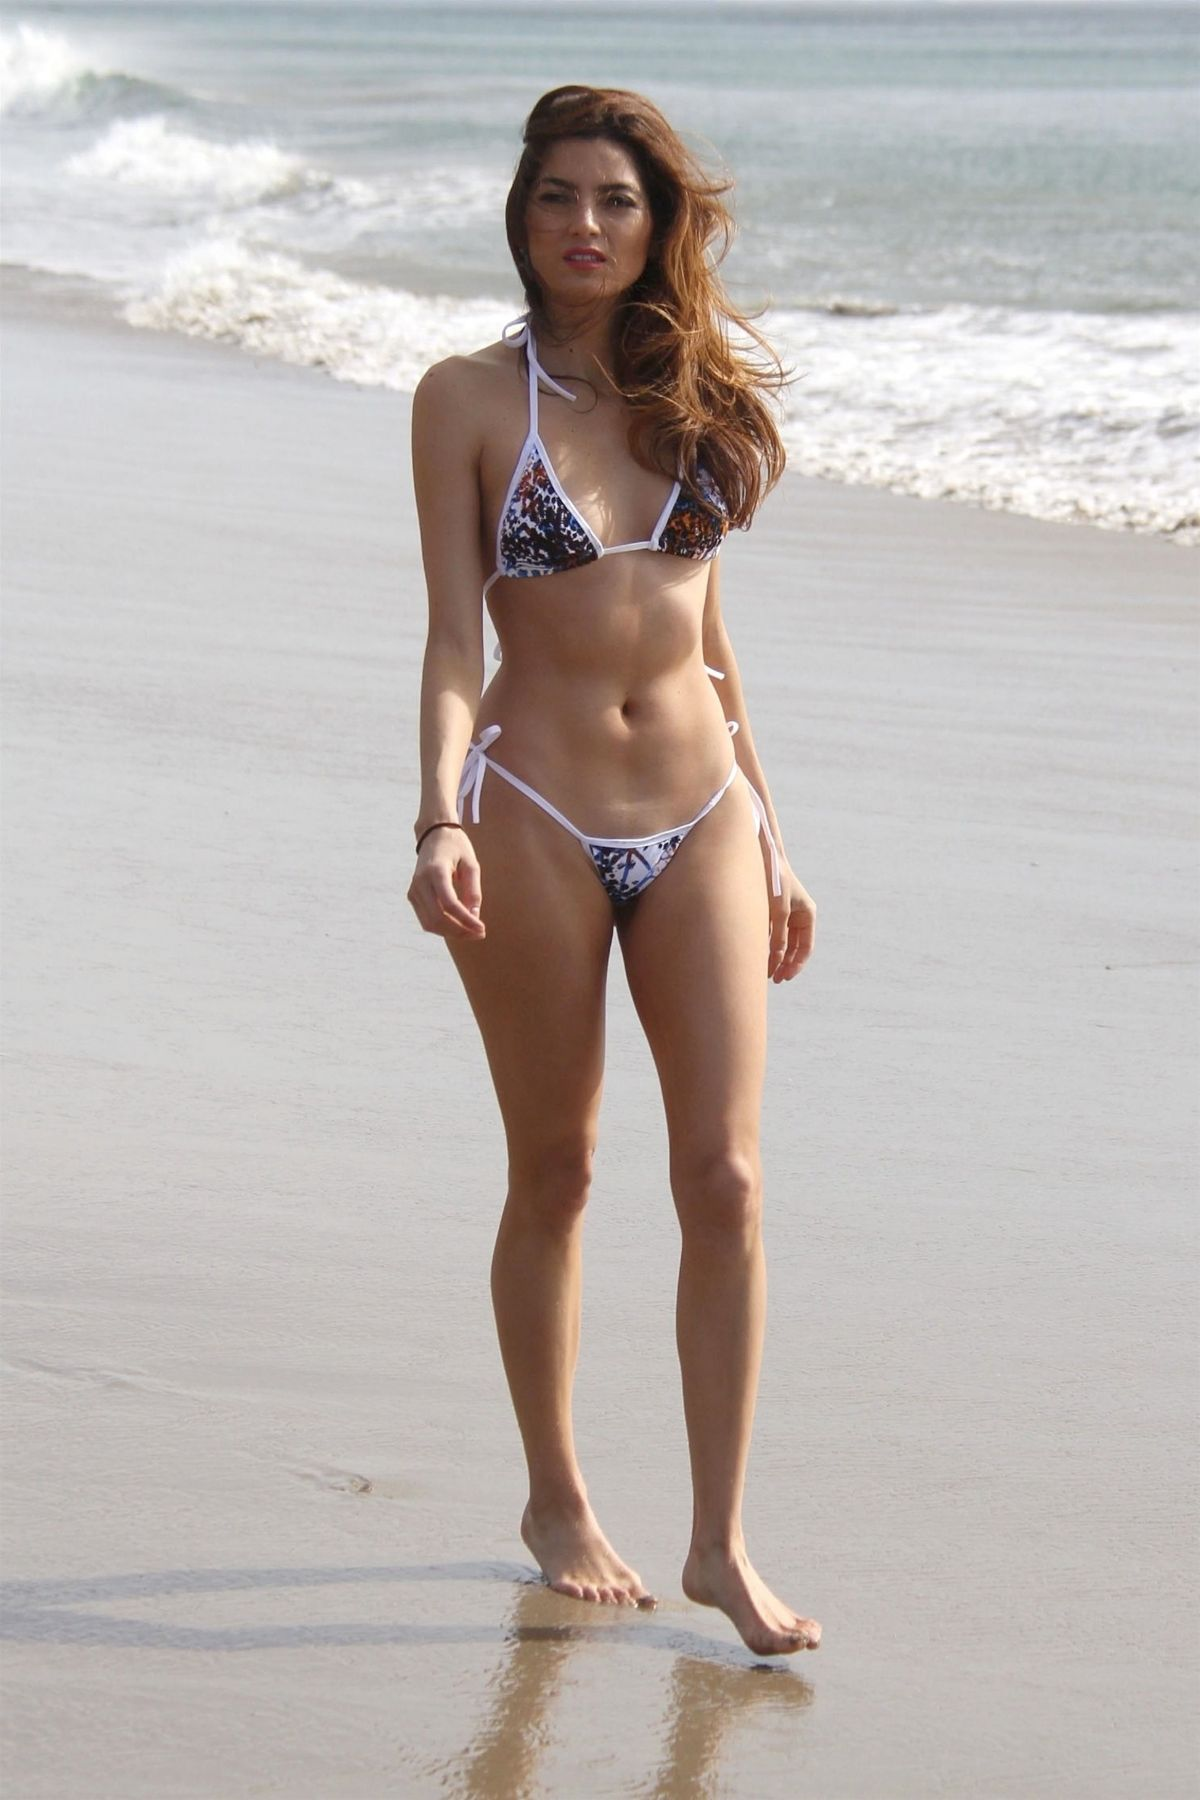 Bikini Blanca Blanco naked (96 photos), Topless, Bikini, Feet, butt 2019